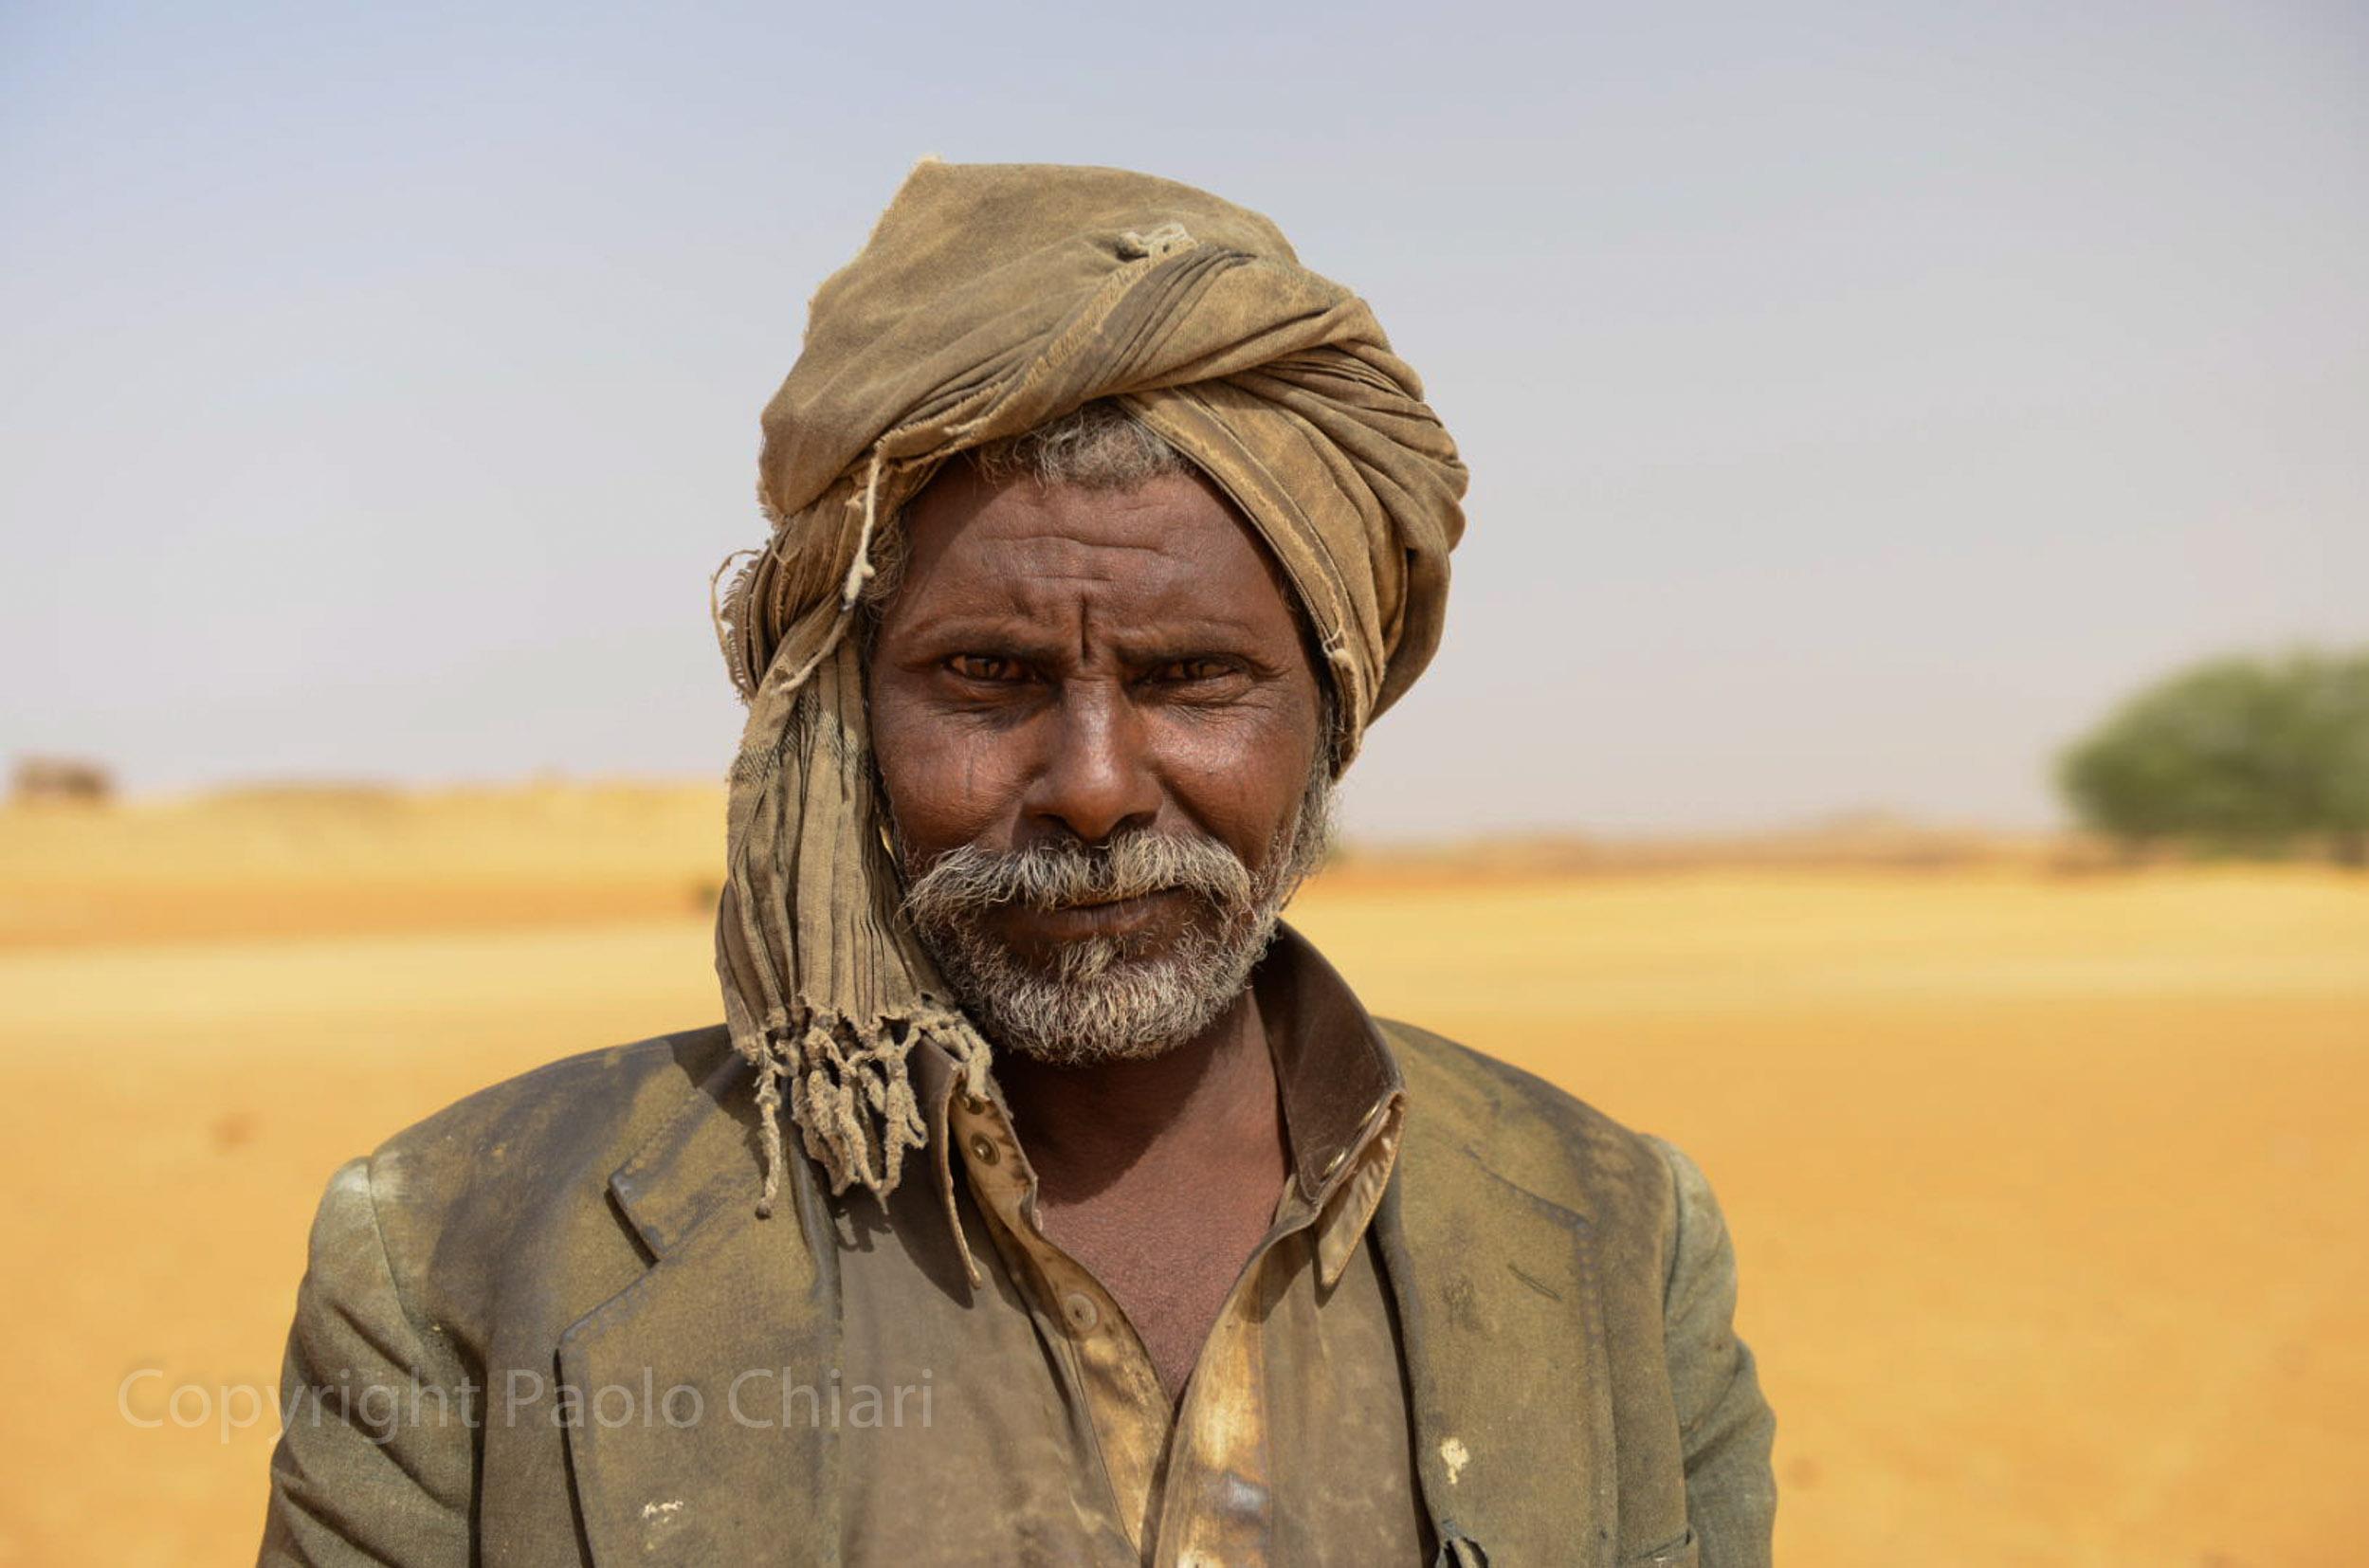 Sudan2013_1861